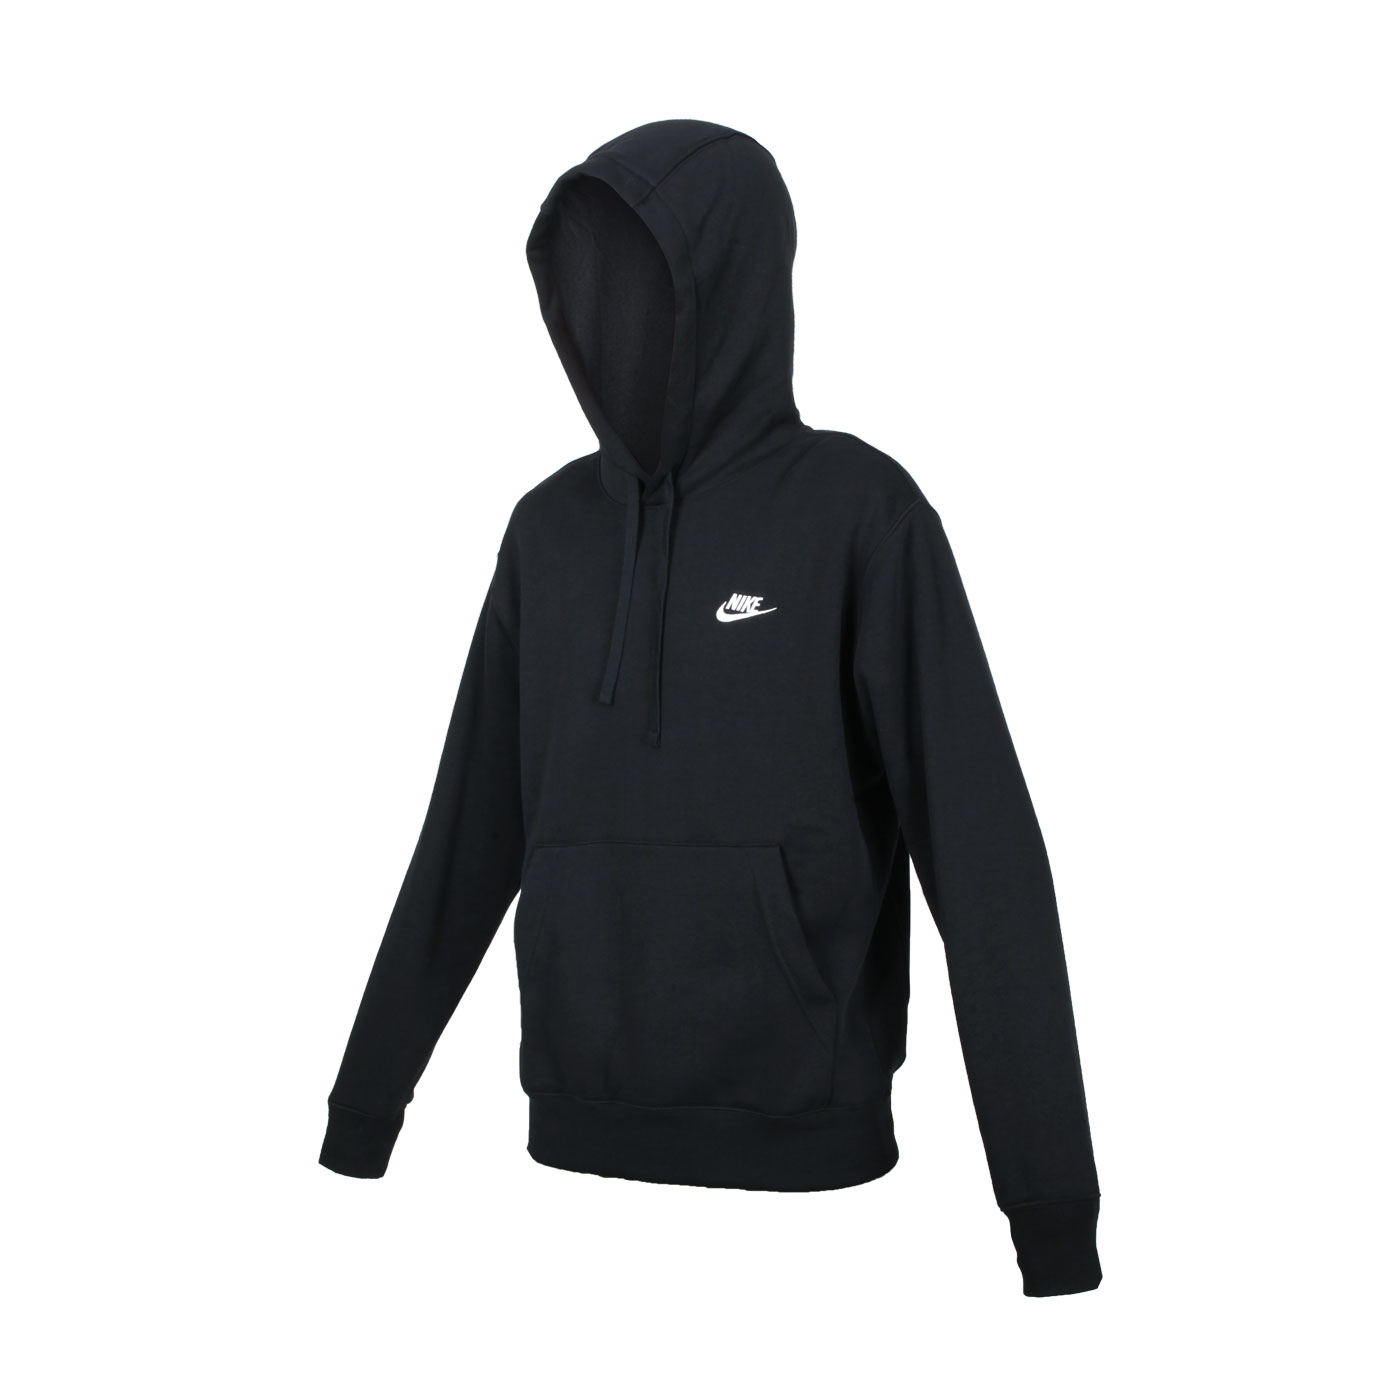 NIKE 男款長袖連帽T恤 BV2655-010 - 黑白